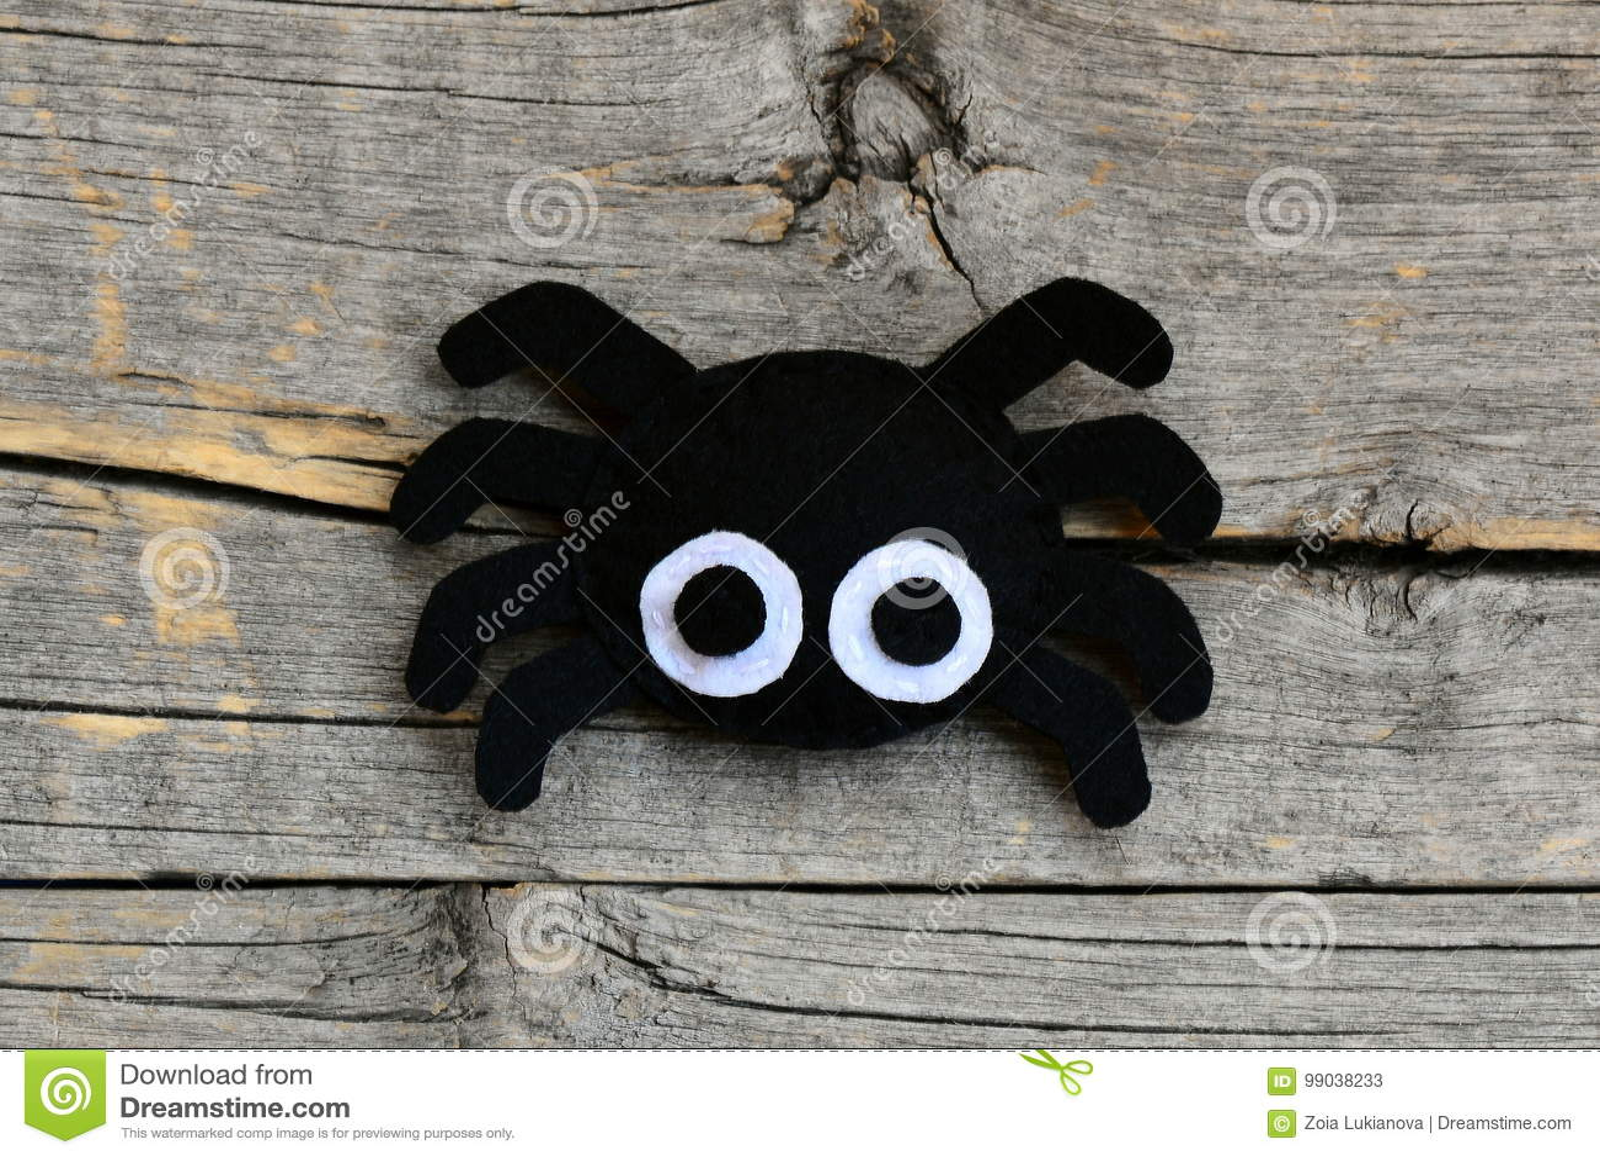 Creating A Felt Halloween Spider Ornament Step Cute Halloween